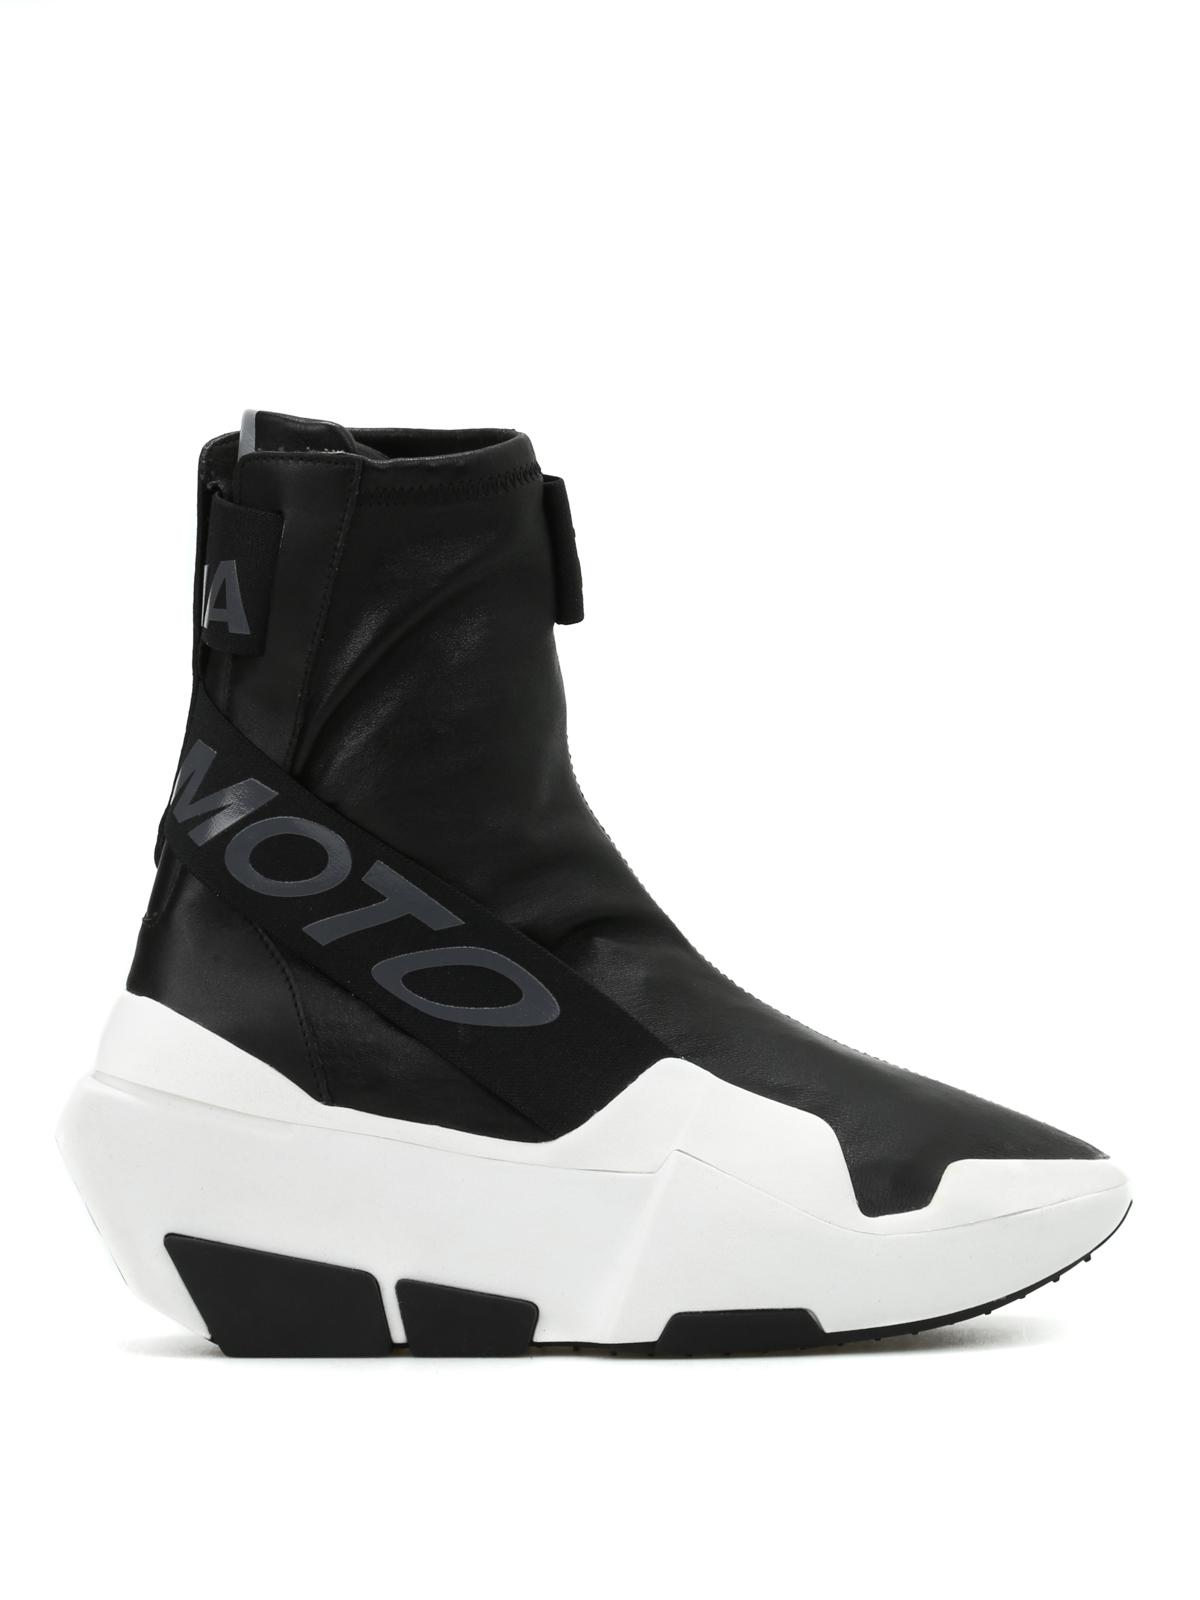 Mira futuristic leather sneakers